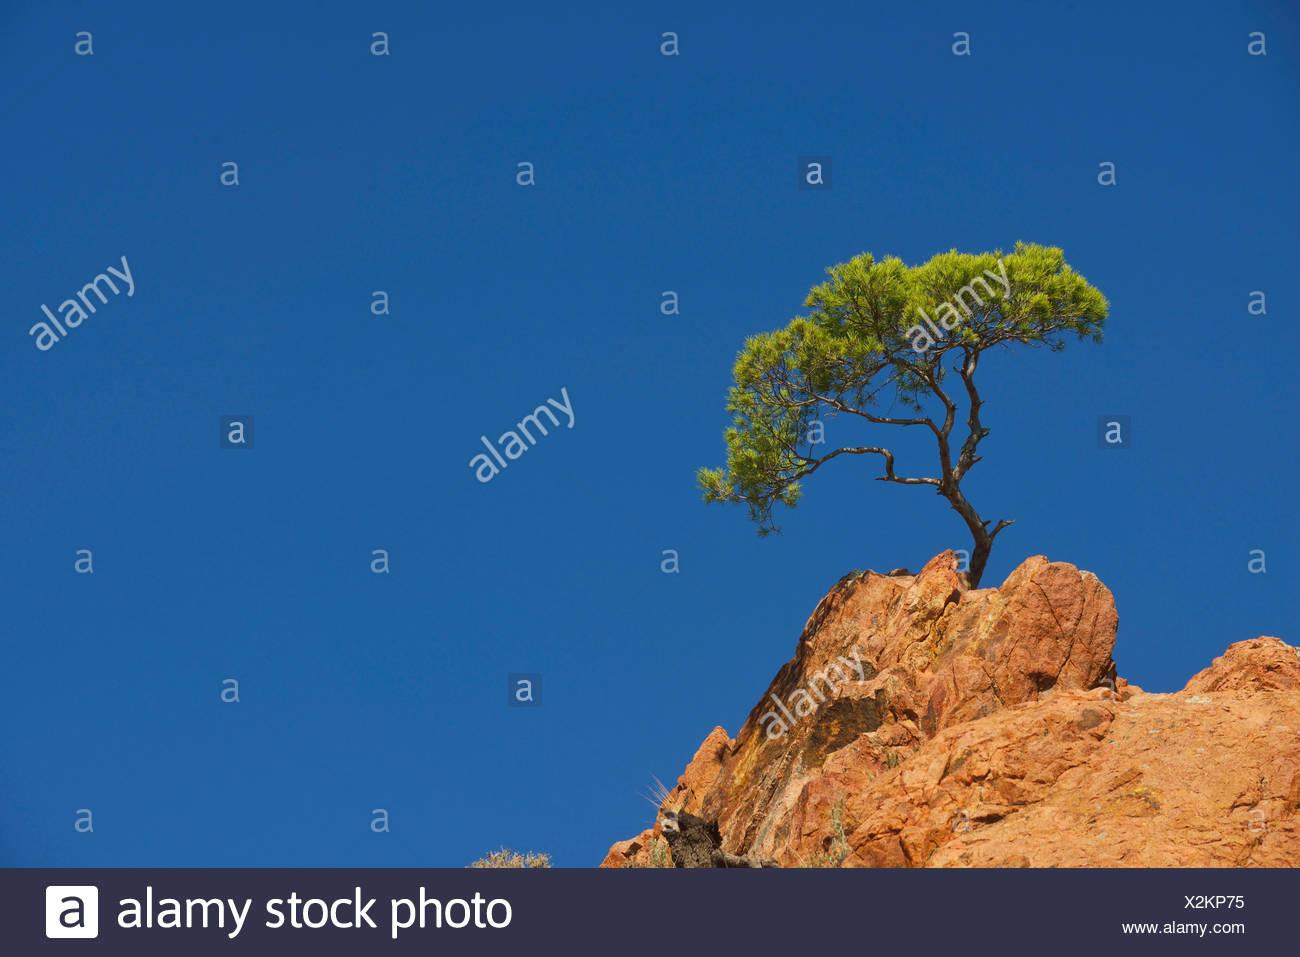 Esterel coast, the Cap Dramont, south east of France, France, Saint Raphael Stock Photo